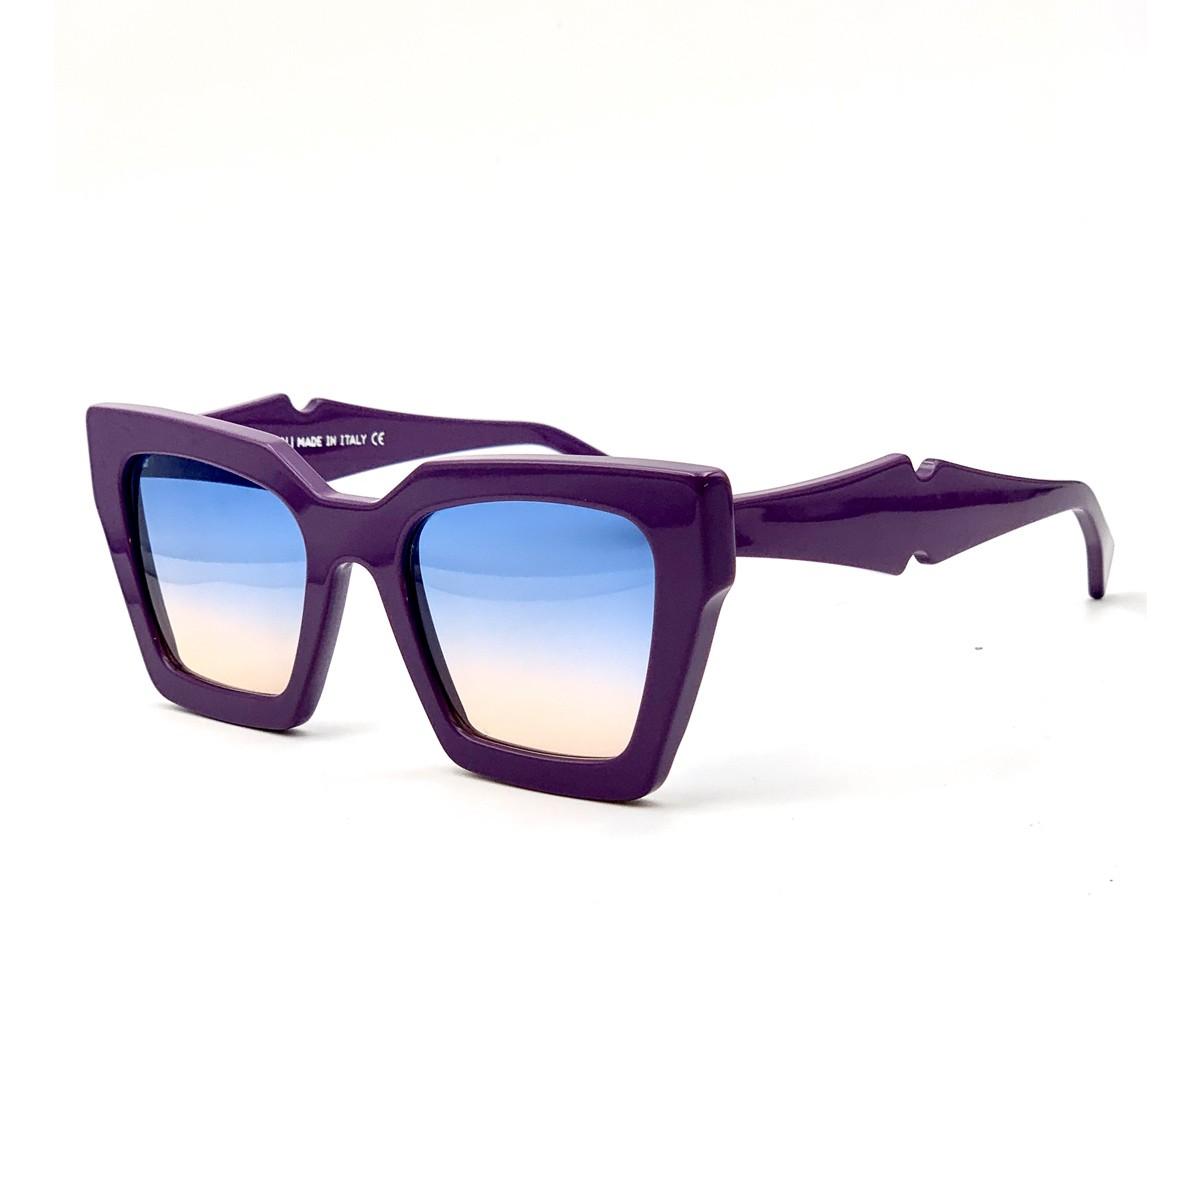 Giuliani H176s   Women's sunglasses